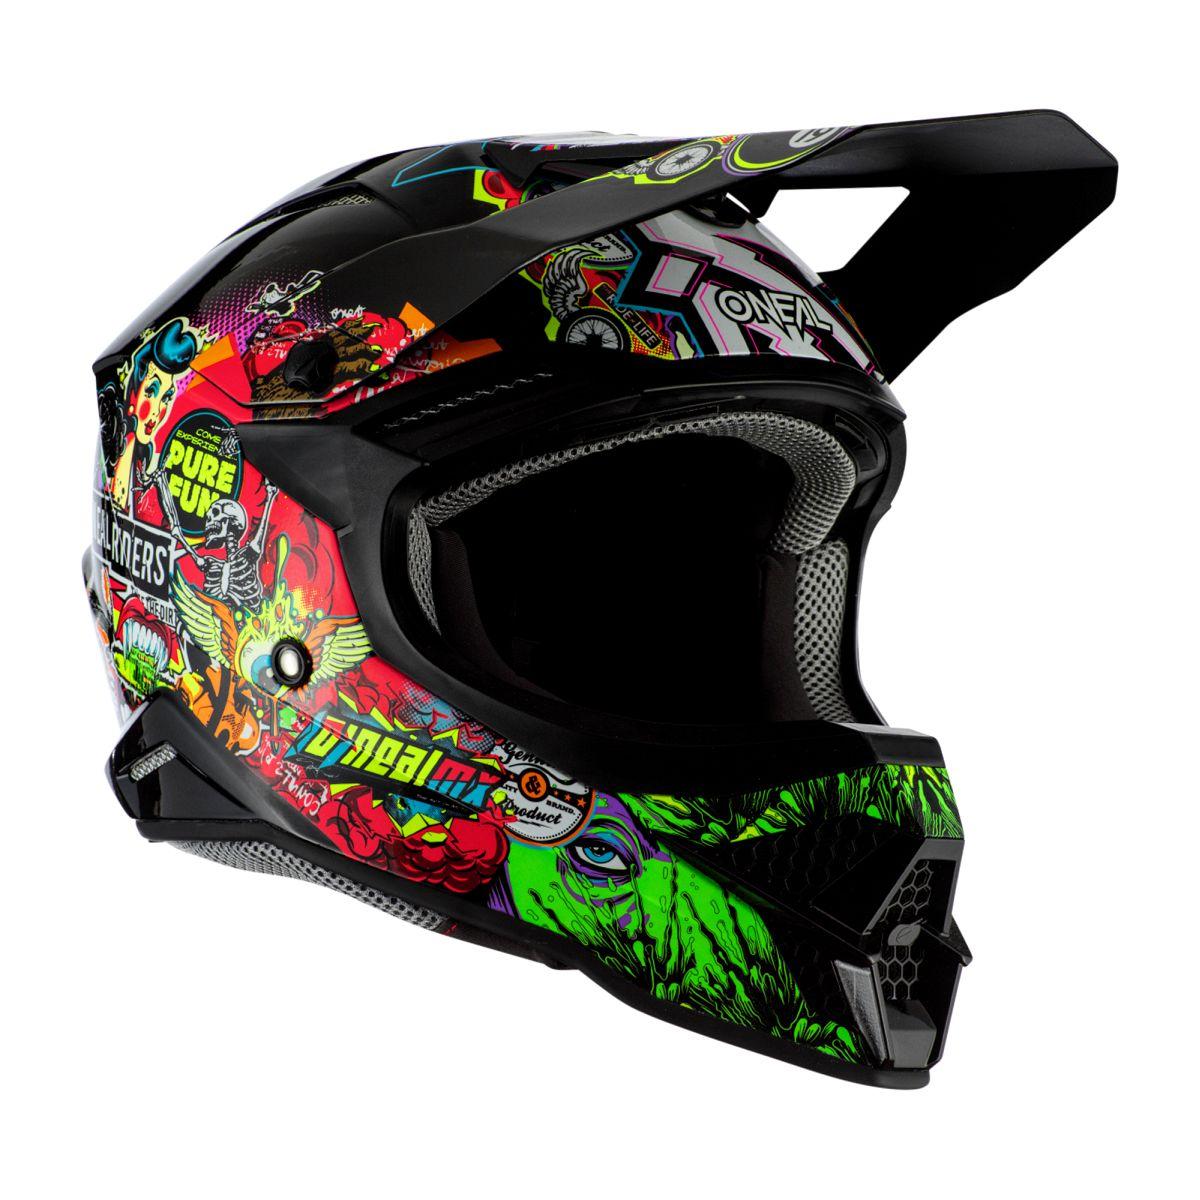 Gr/ö/ße ONeal 3 Series Crank 2.0 Motocross Enduro MTB Helm schwarz//Multi 2020 Oneal M 57-58cm